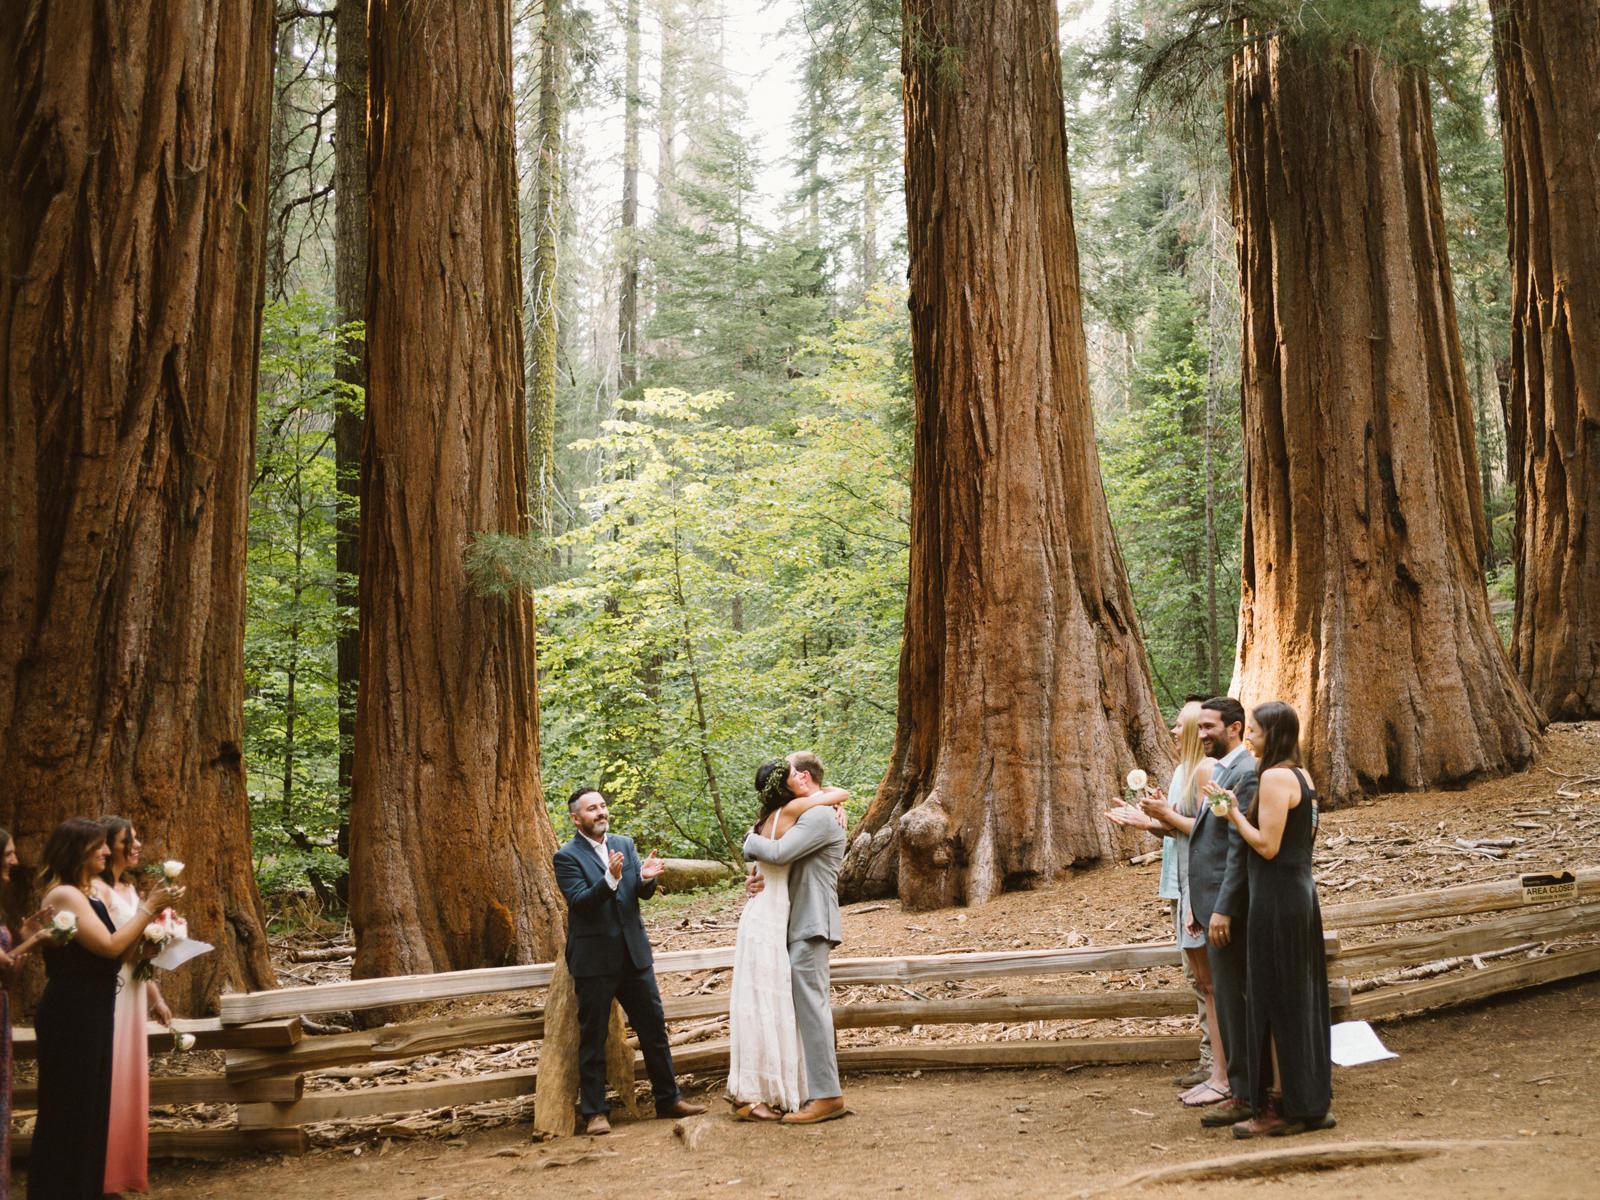 yosemite-intimate-wedding-065 YOSEMITE INTIMATE WEDDING